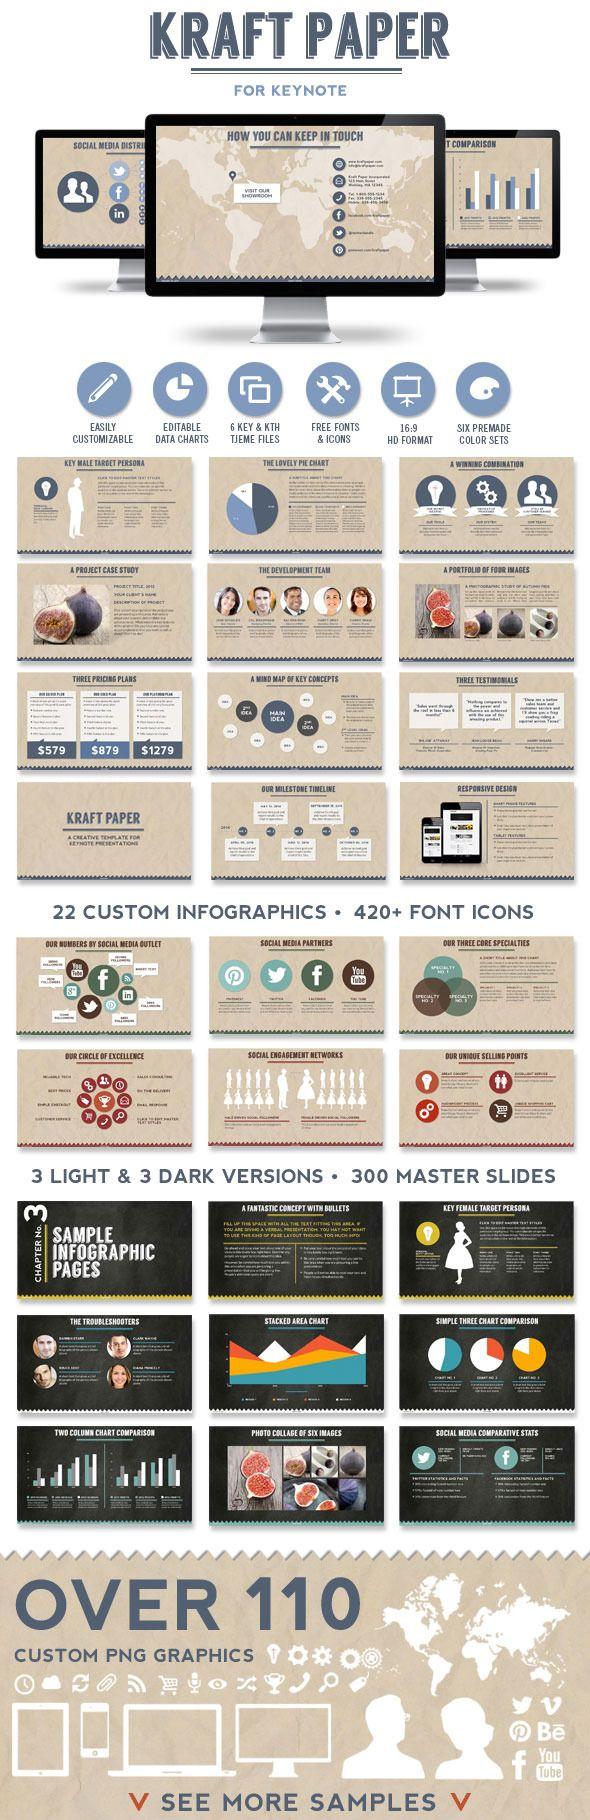 Kraft Paper Keynote Presentation Template #keynote #keynotetemplate #presentation Download: http://graphicriver.net/item/kraft-paper-keynote-presentation-template/6748850?ref=ksioks